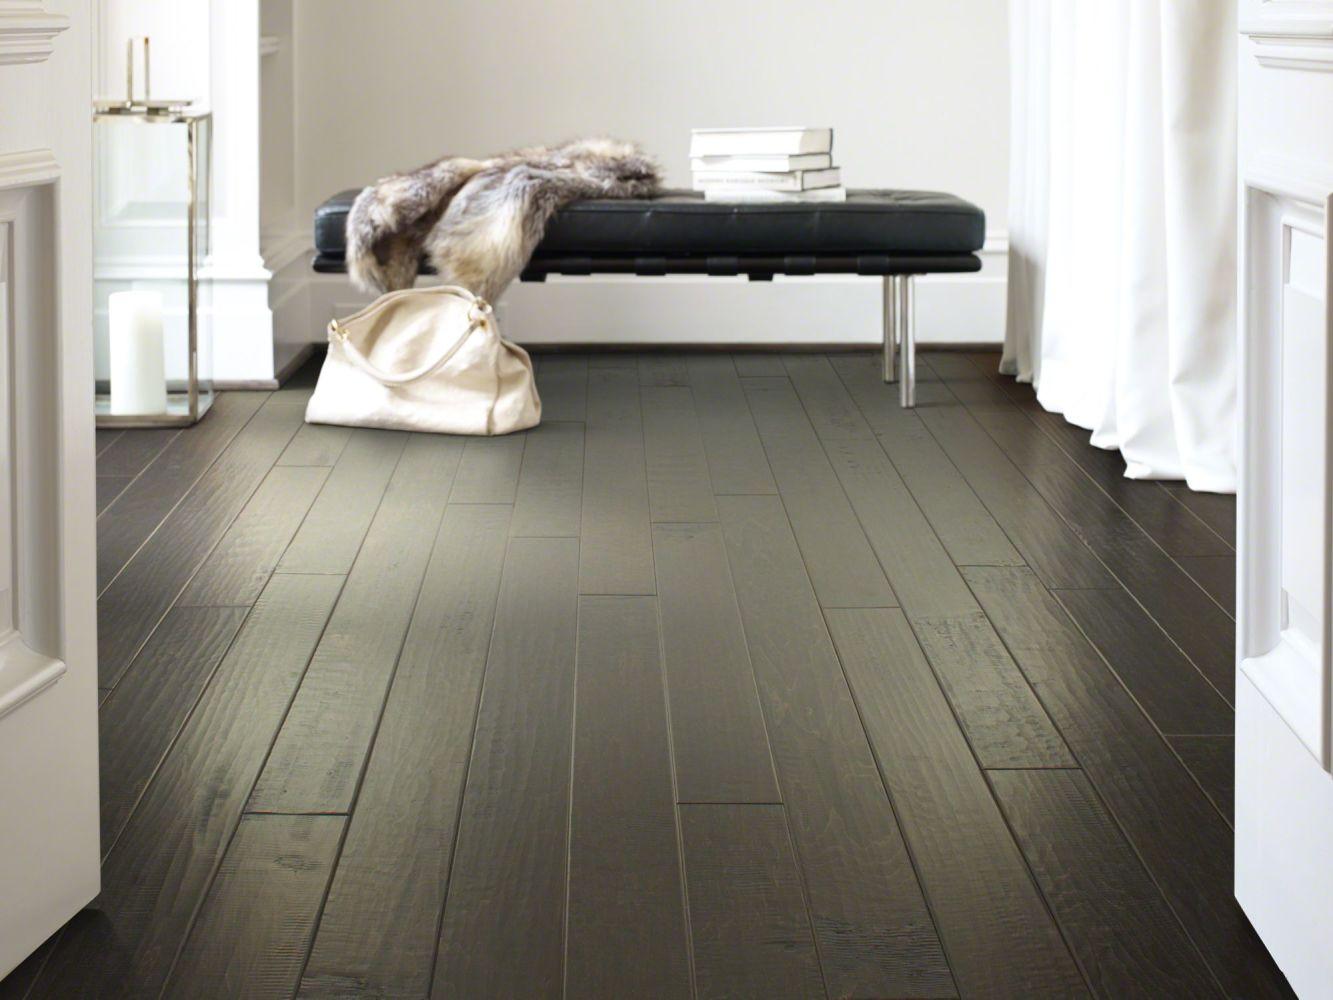 Shaw Floors Home Fn Gold Hardwood Mackenzie Maple 2 -5″ Midnight 09003_HW604